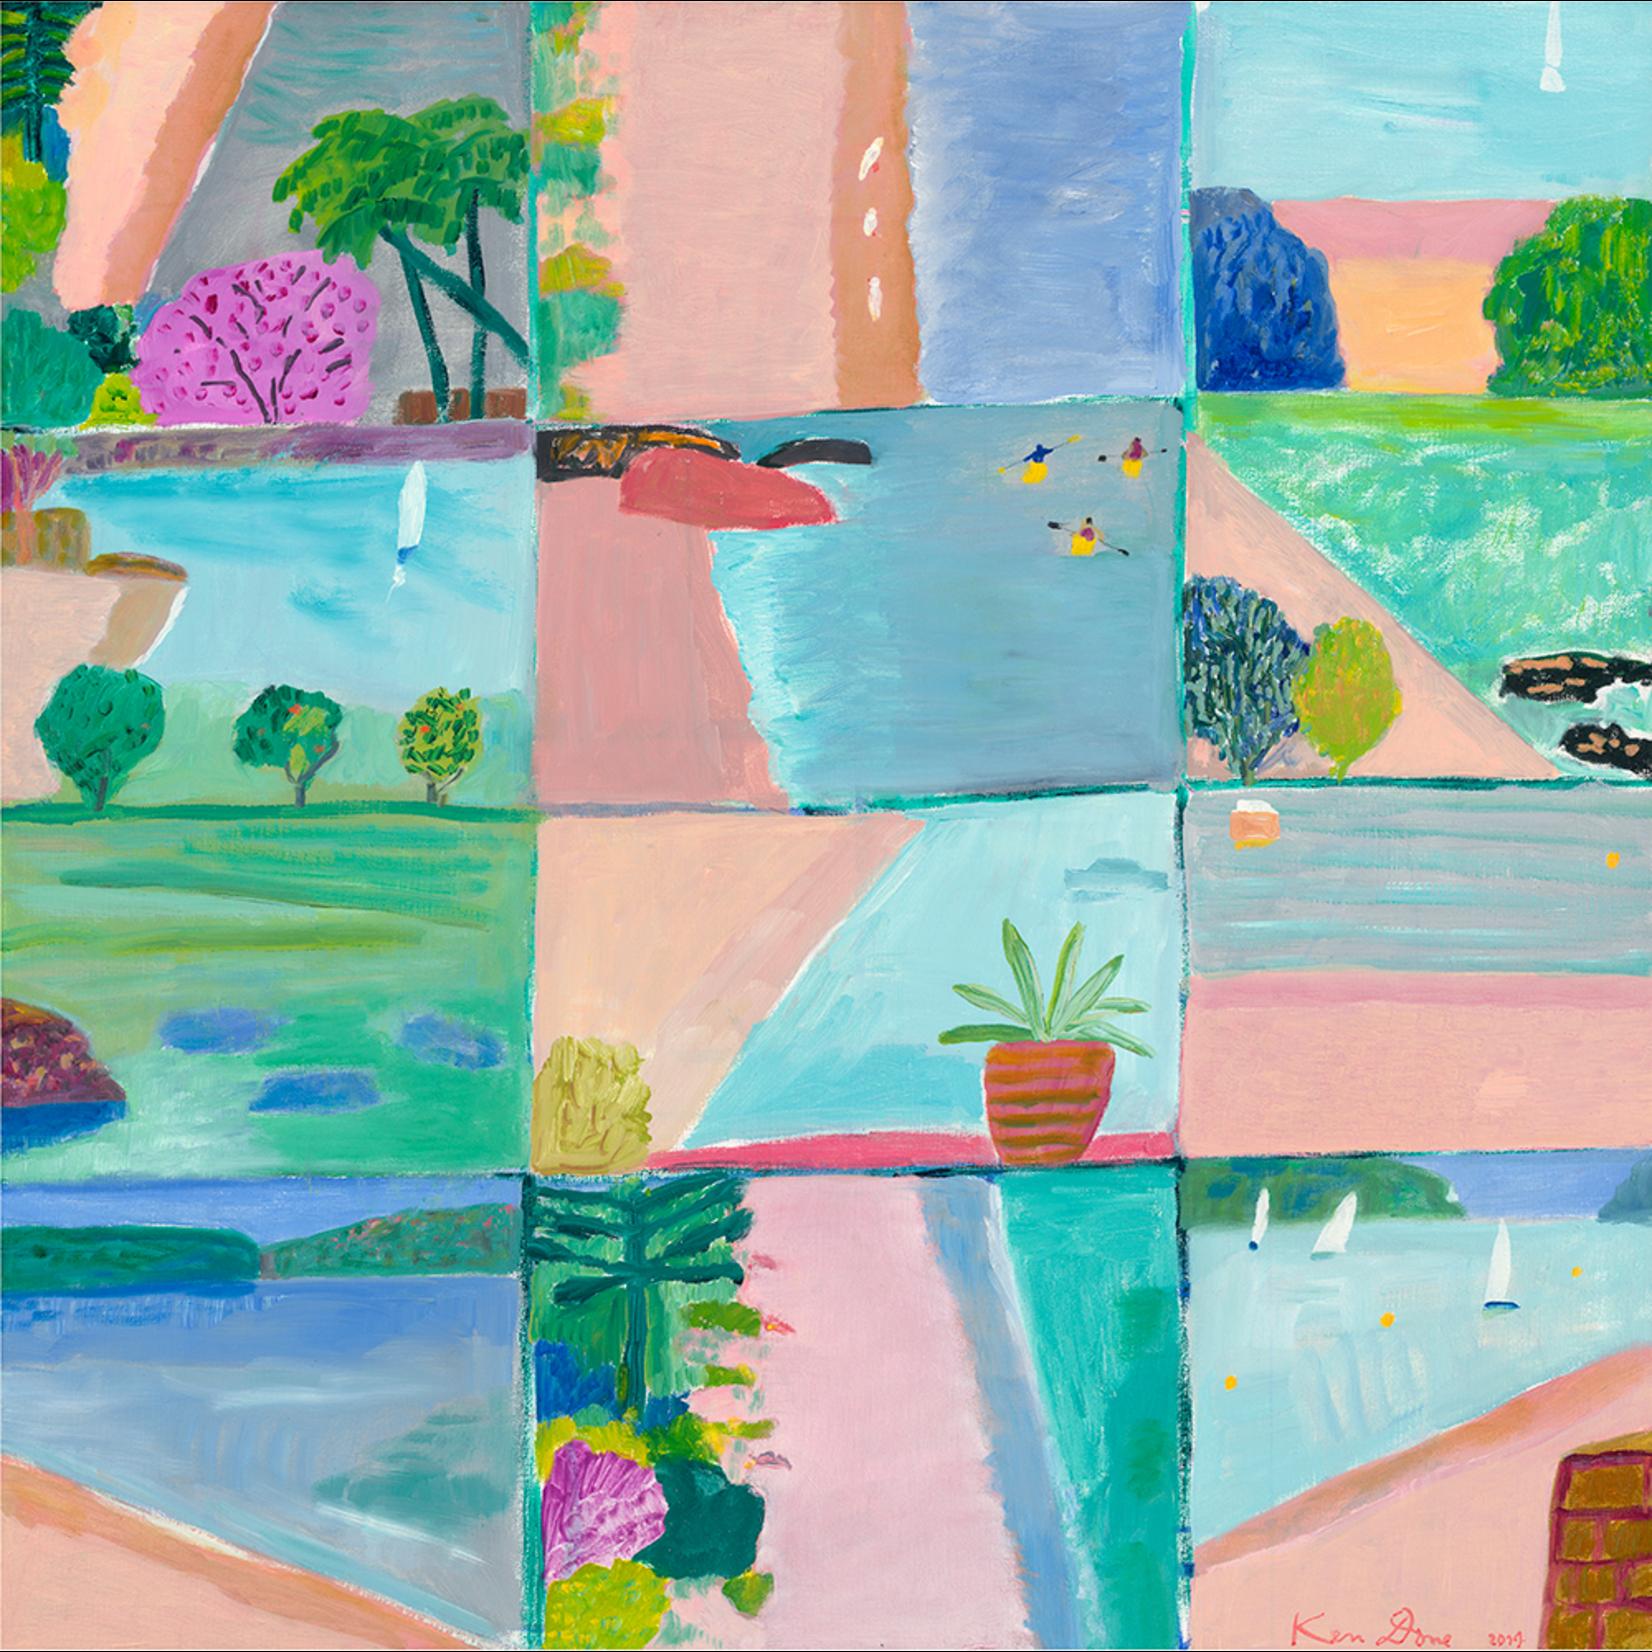 Limited Edition Prints 12 views of Chinamans Beach, 2014